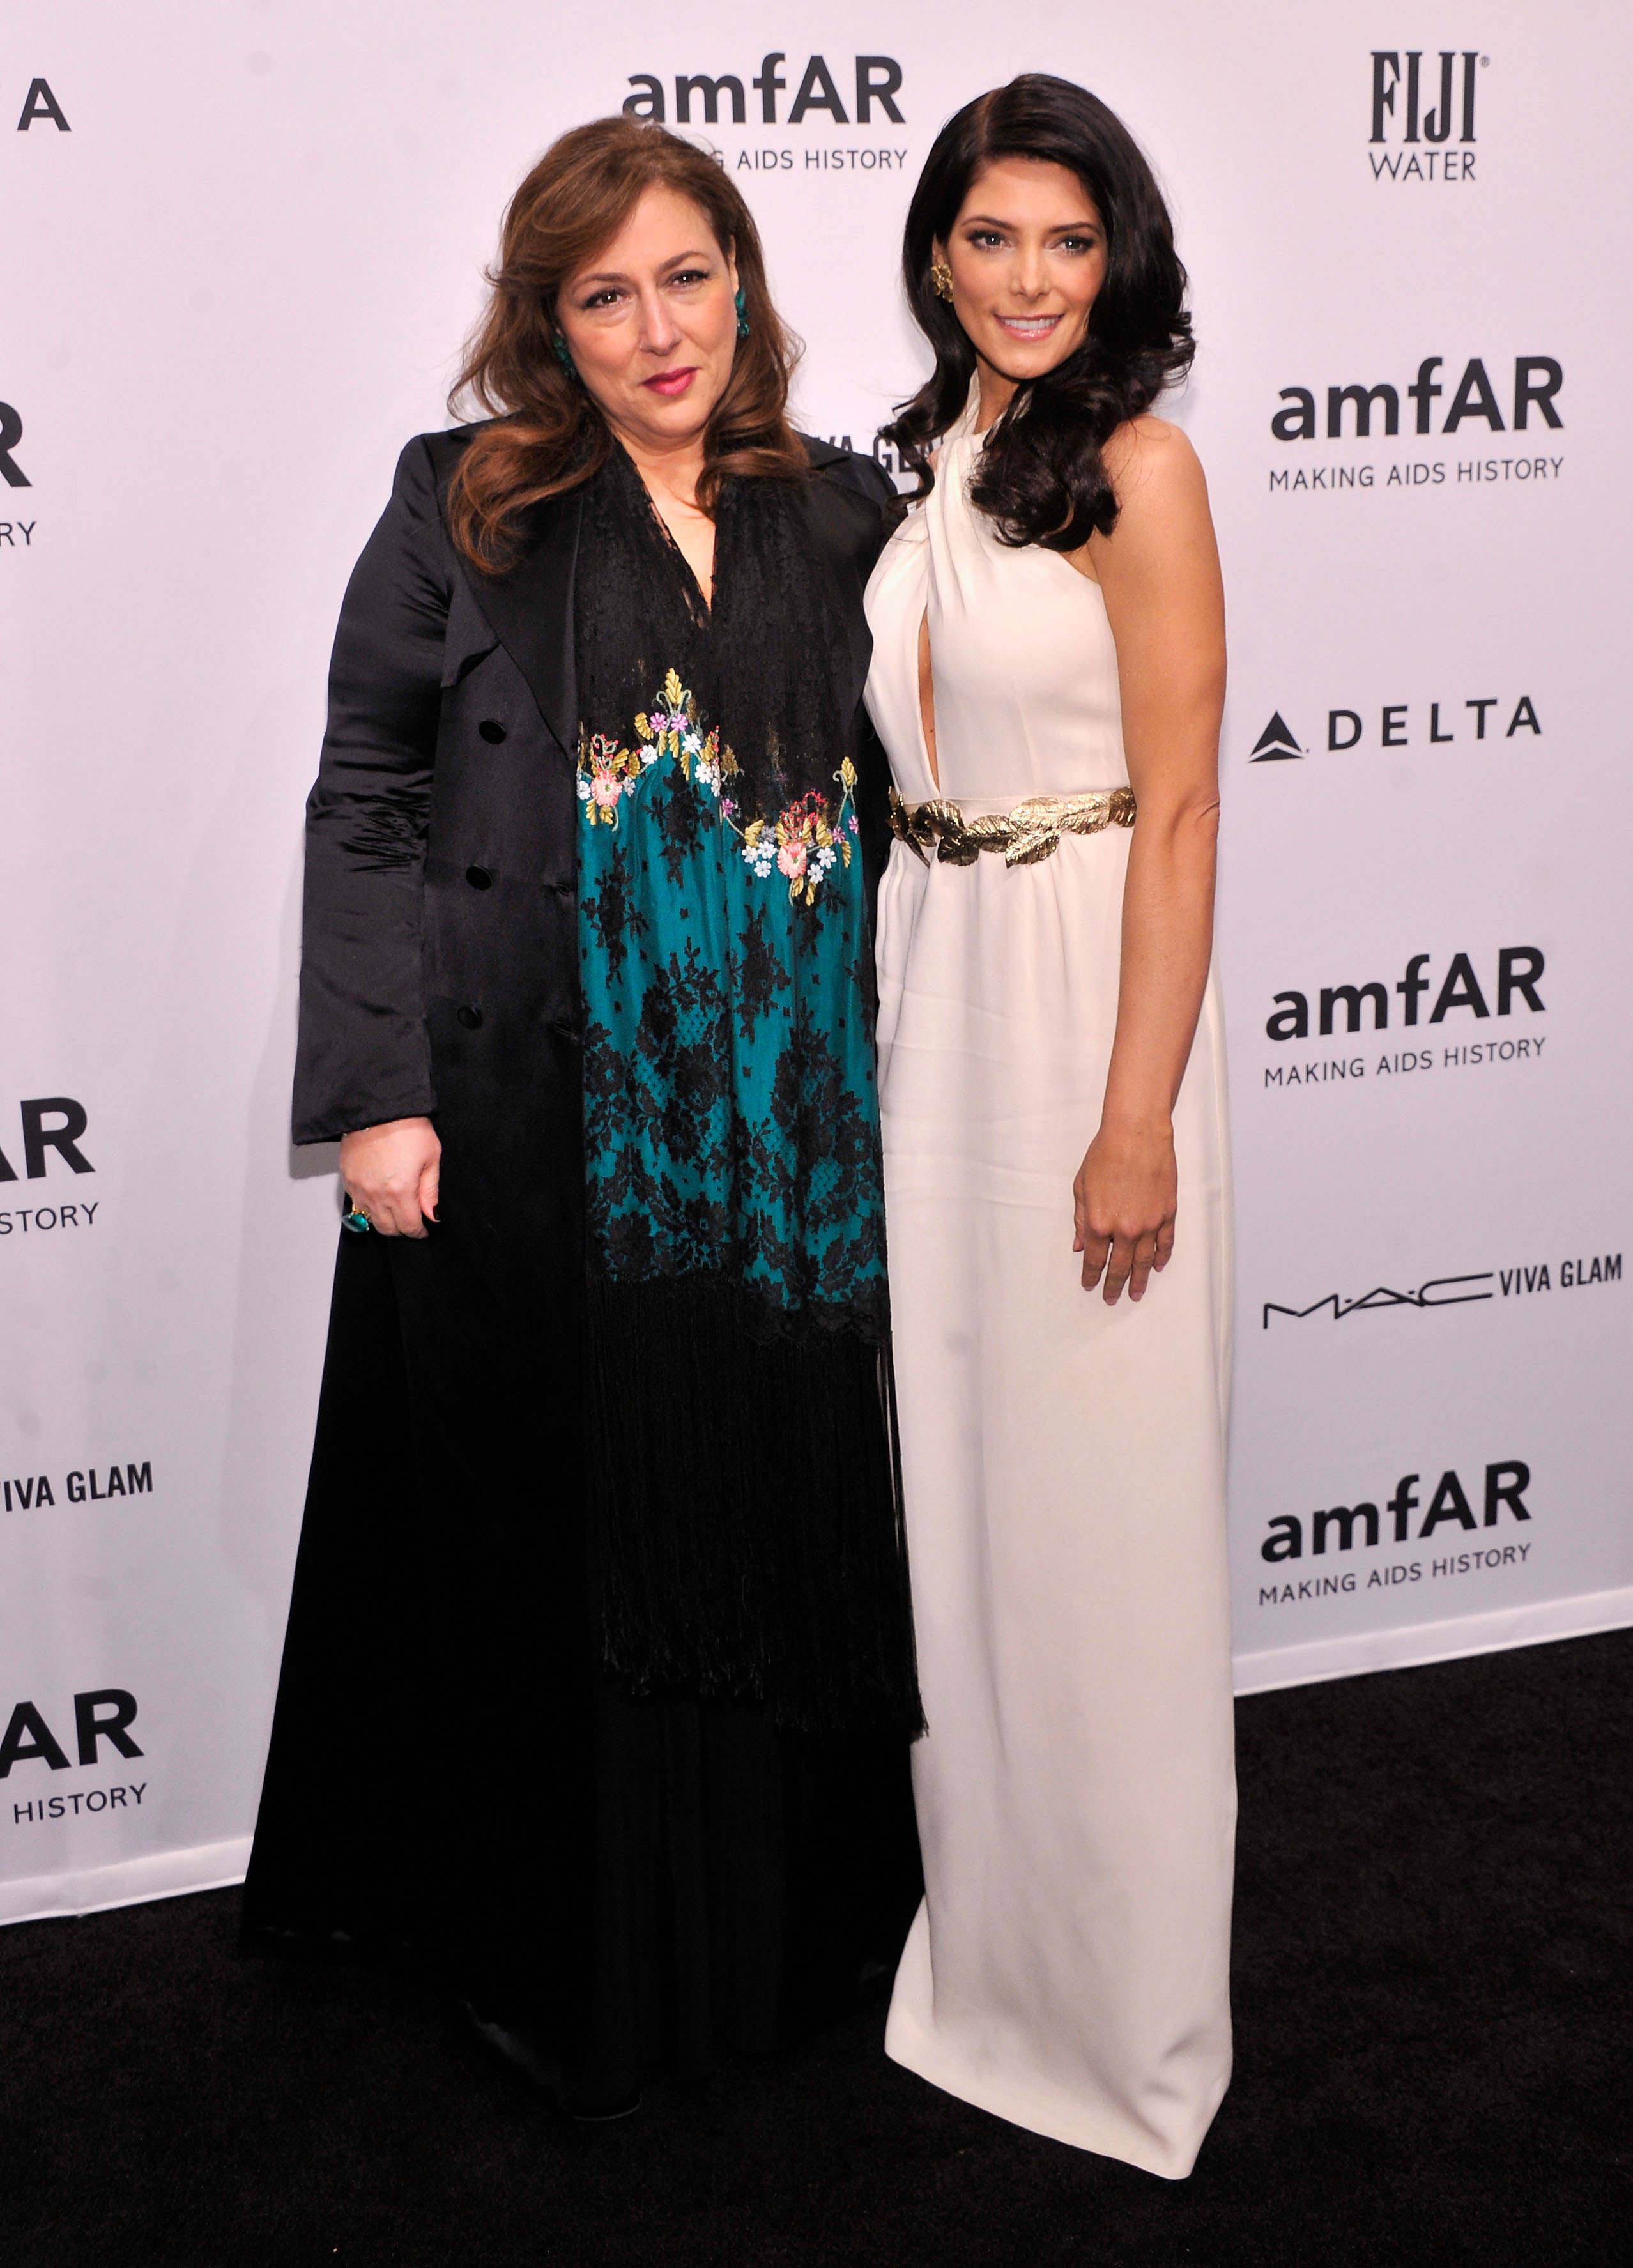 Lorraine Schwartz and Ashley Greene smiled for photos at Wednesday's amfAR Gala in NYC.